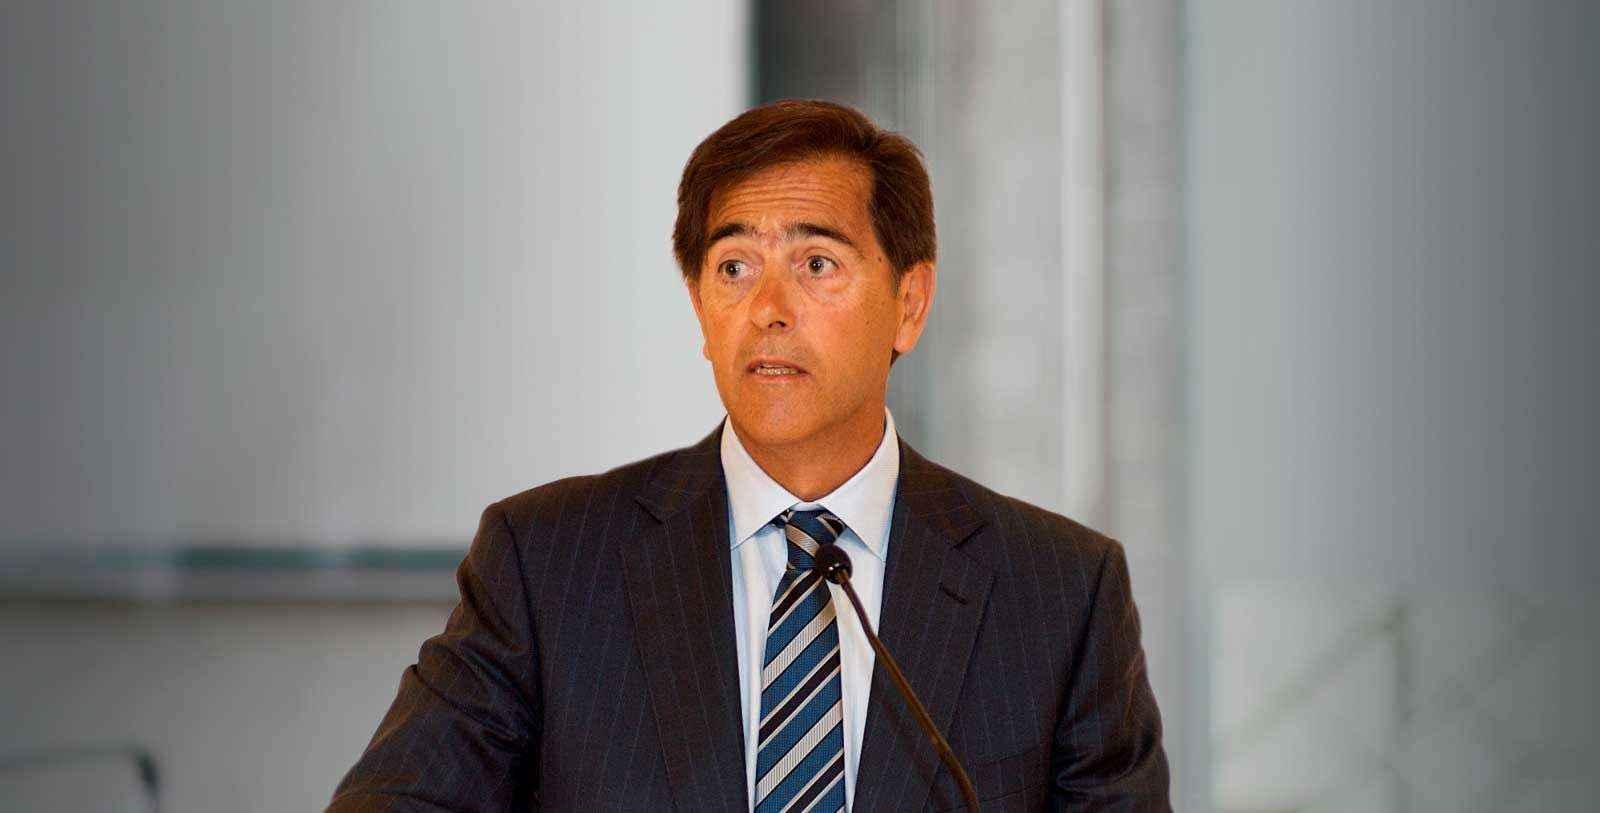 Eduardo Tormo participará como ponente en la FIF Chile 2020, Feria Internacional de Franquicias de Chile